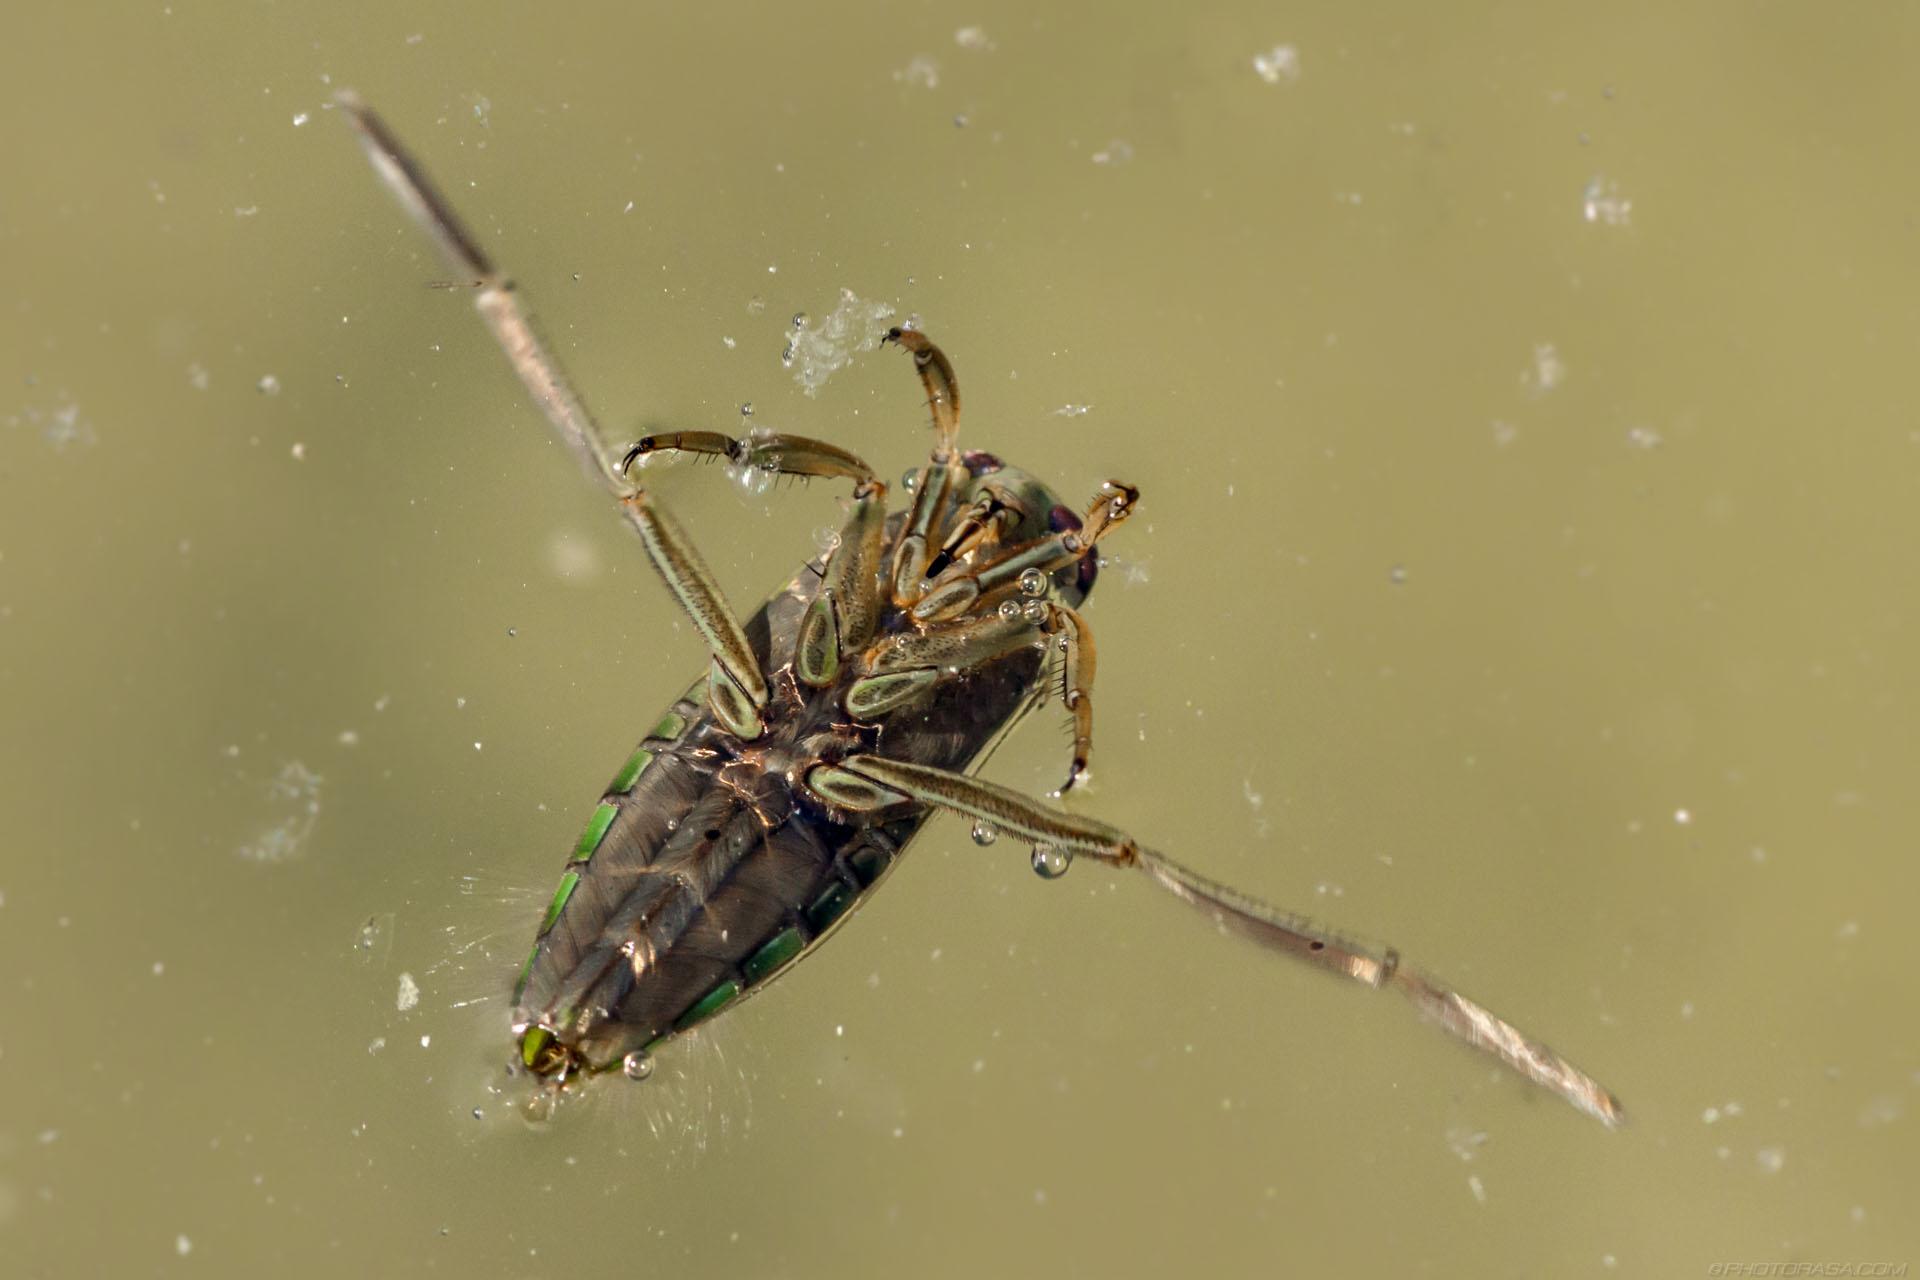 http://photorasa.com/dragonflies/dragonfly-larva/